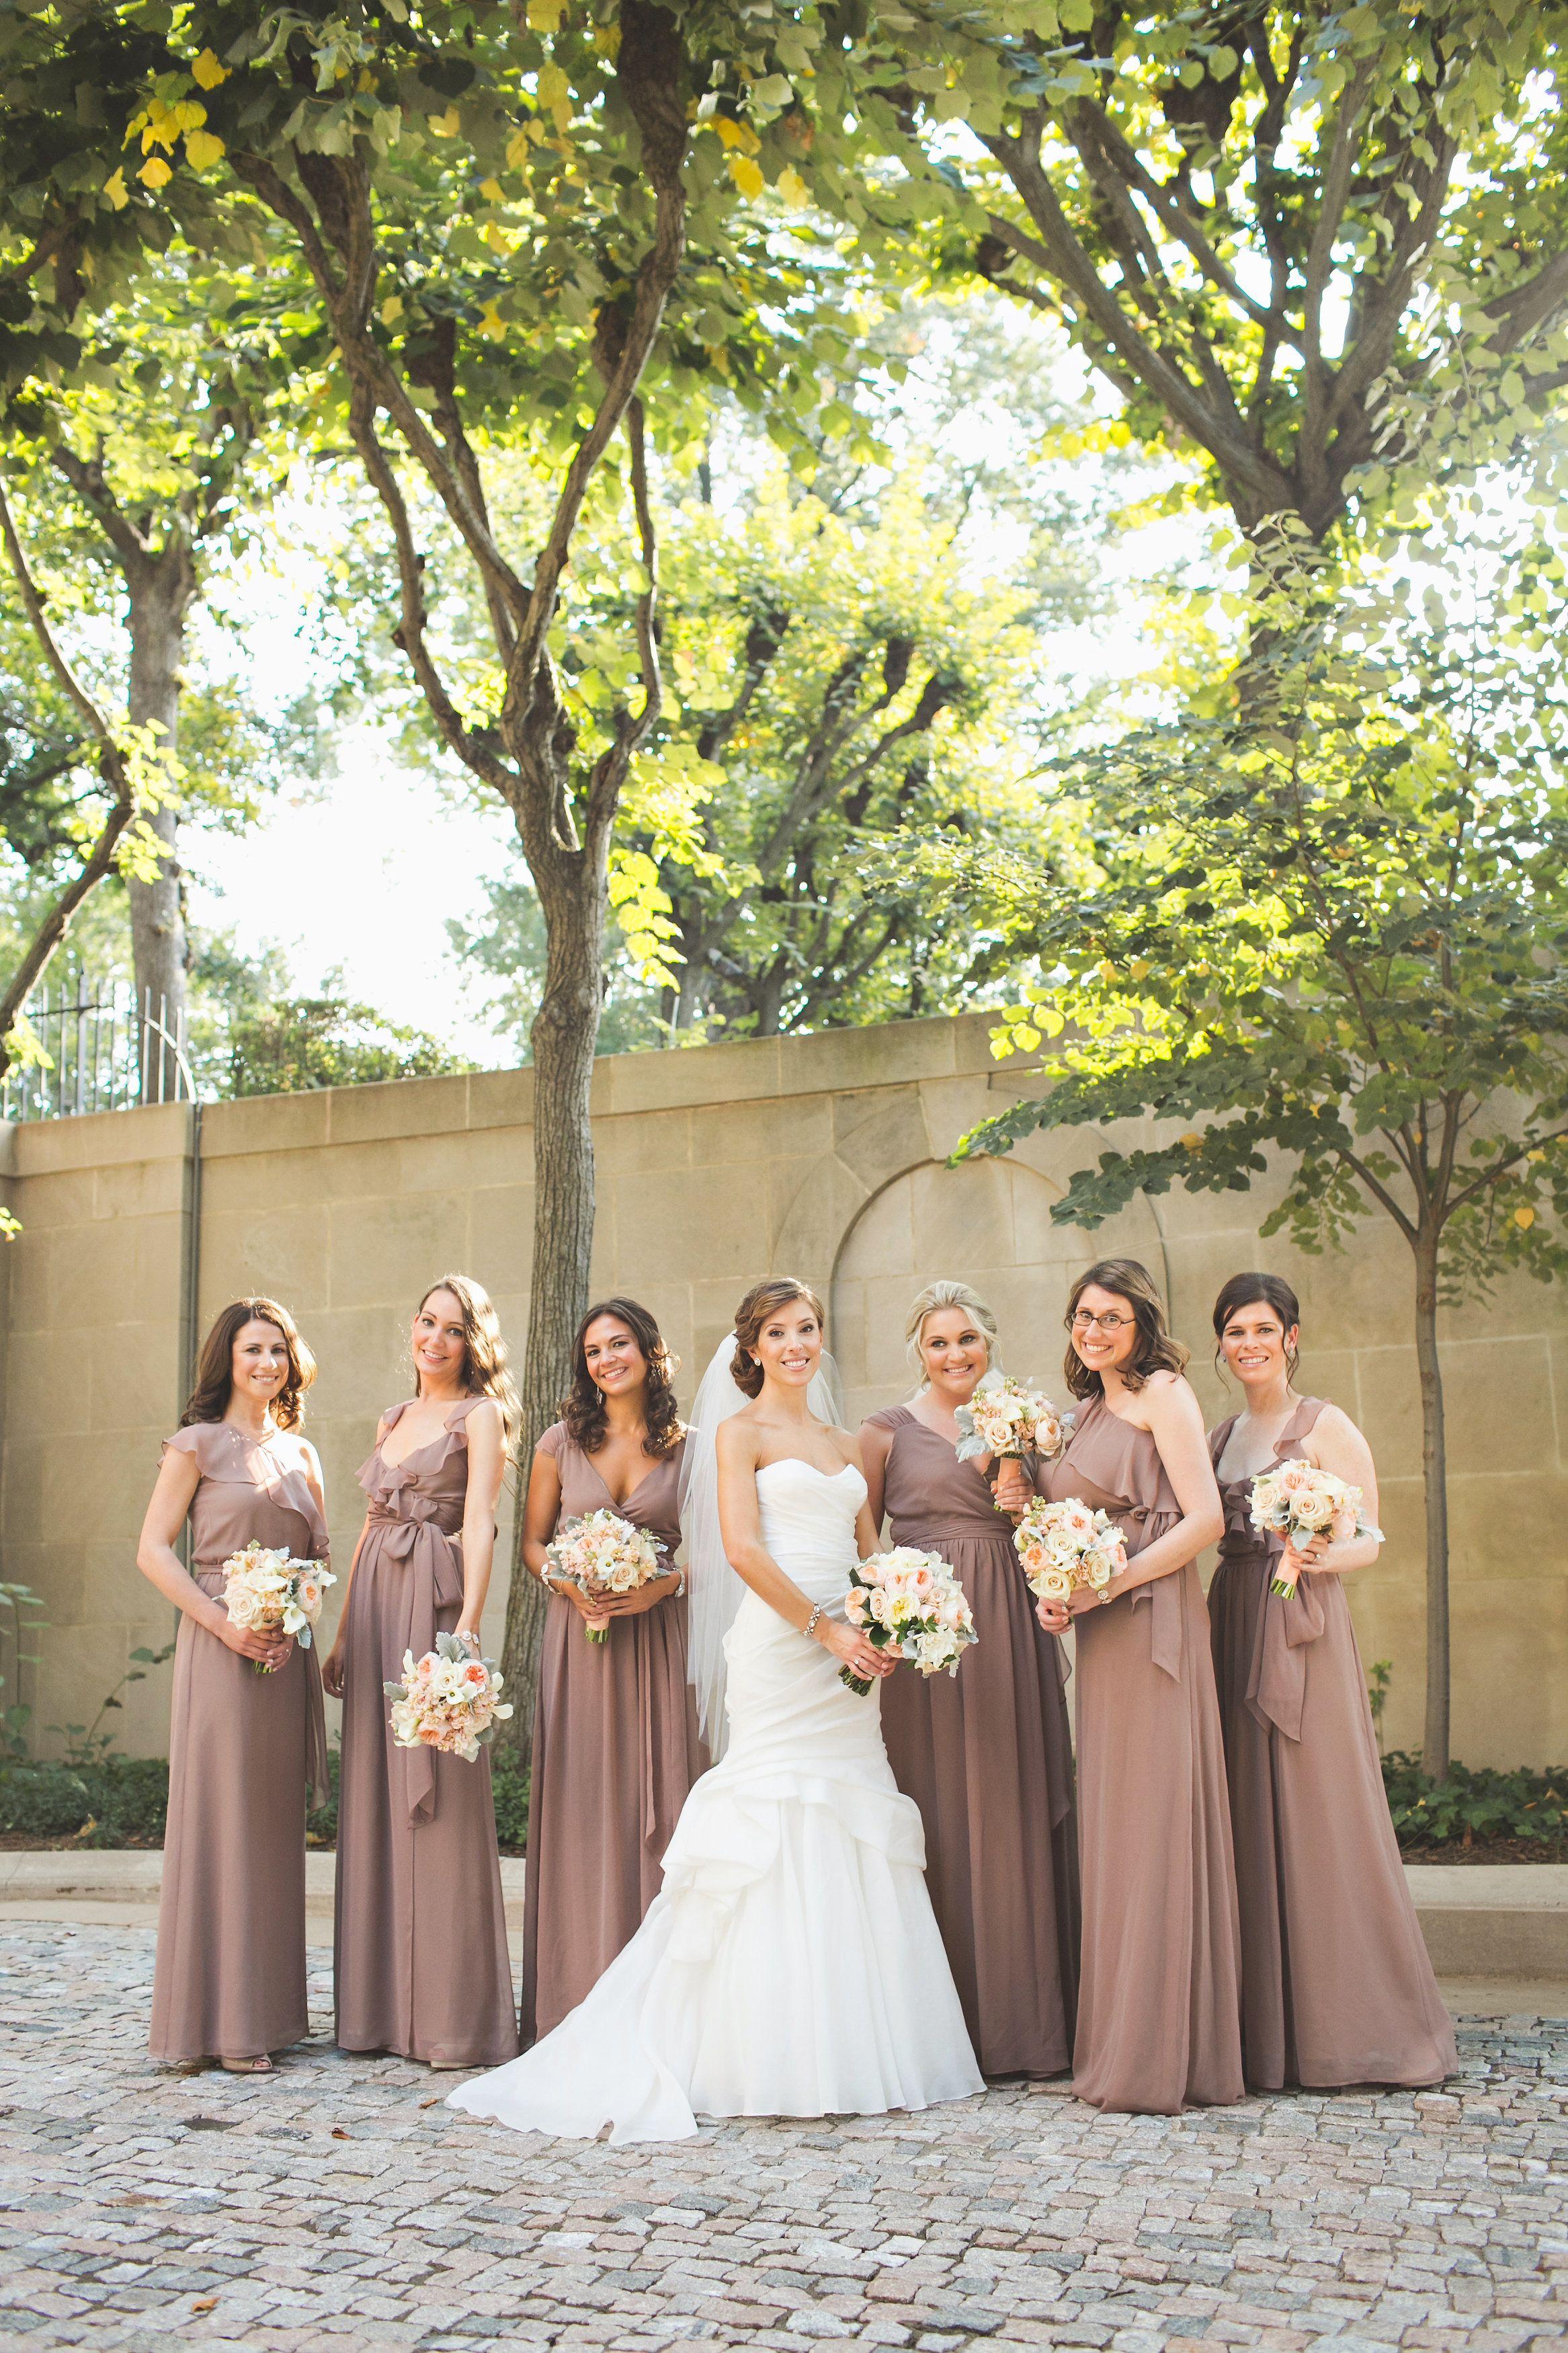 Gallery Inspiration Picture 1459519 Mauve Bridesmaid Dress Taupe Bridesmaid Dresses Beautiful Bridesmaid Dresses